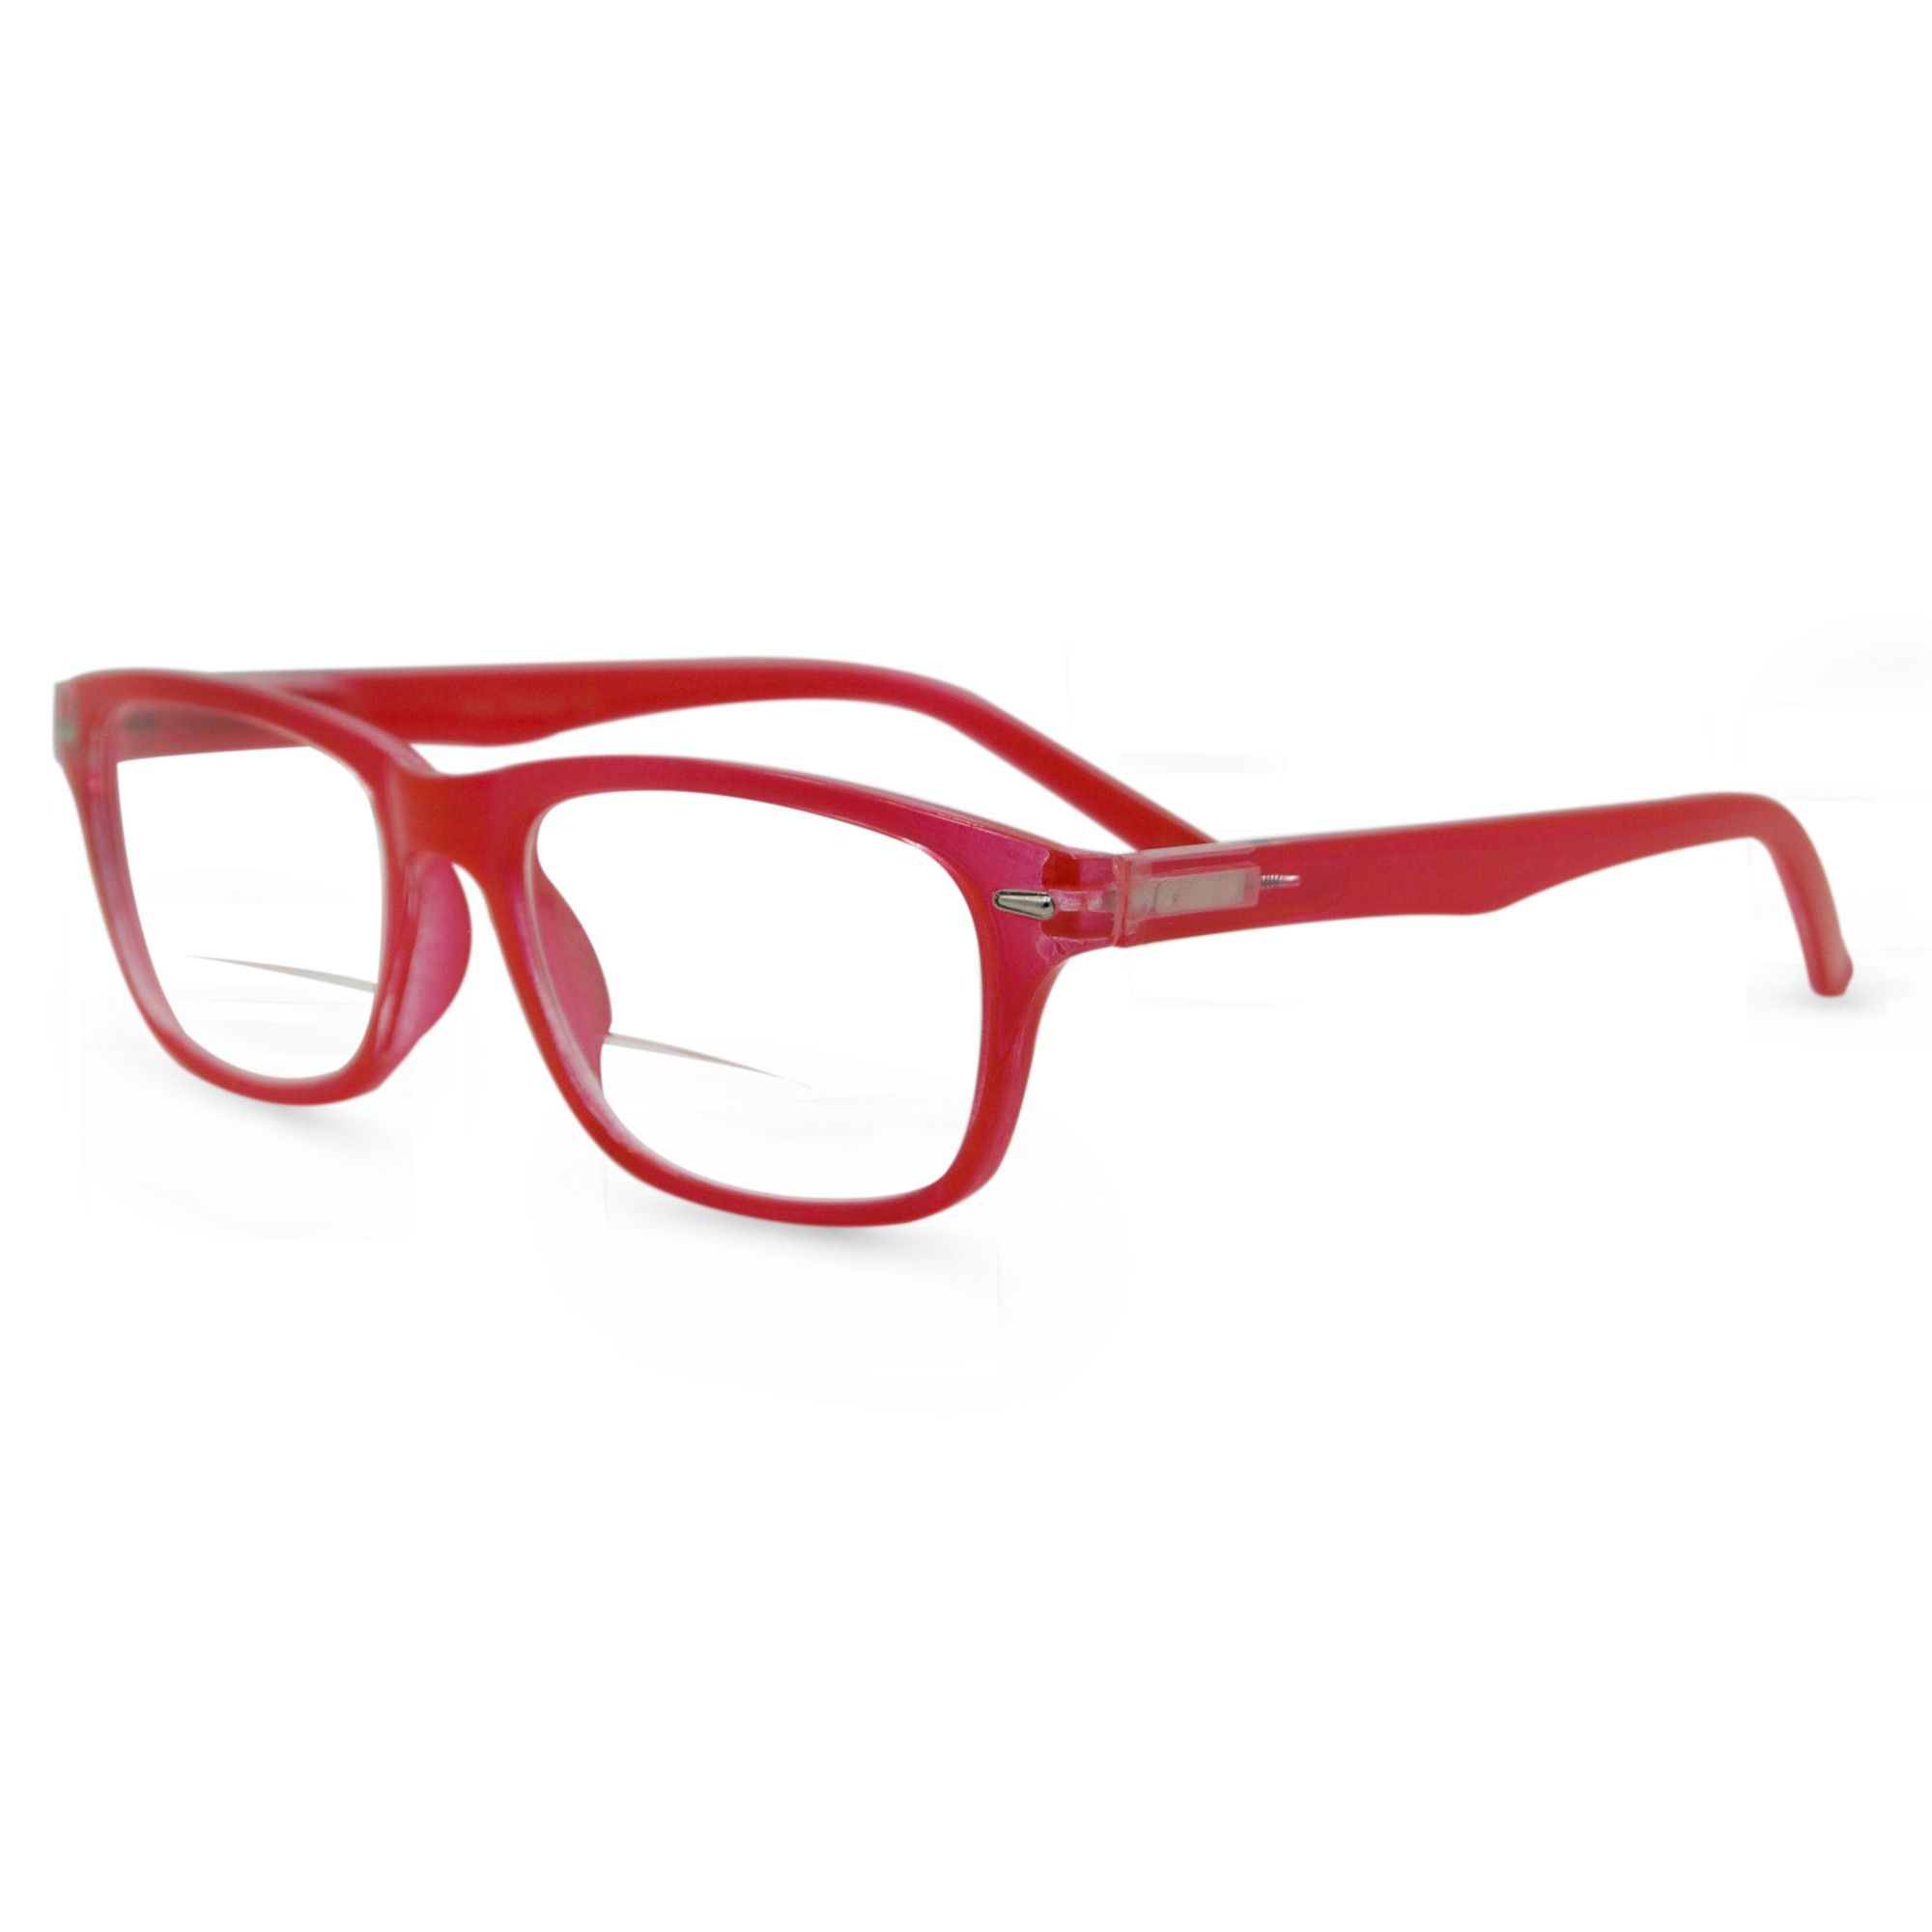 d542b4570a6 In Style Eyes Seymore Wayfarer BiFocal Reading Glasses for Both Men   Women